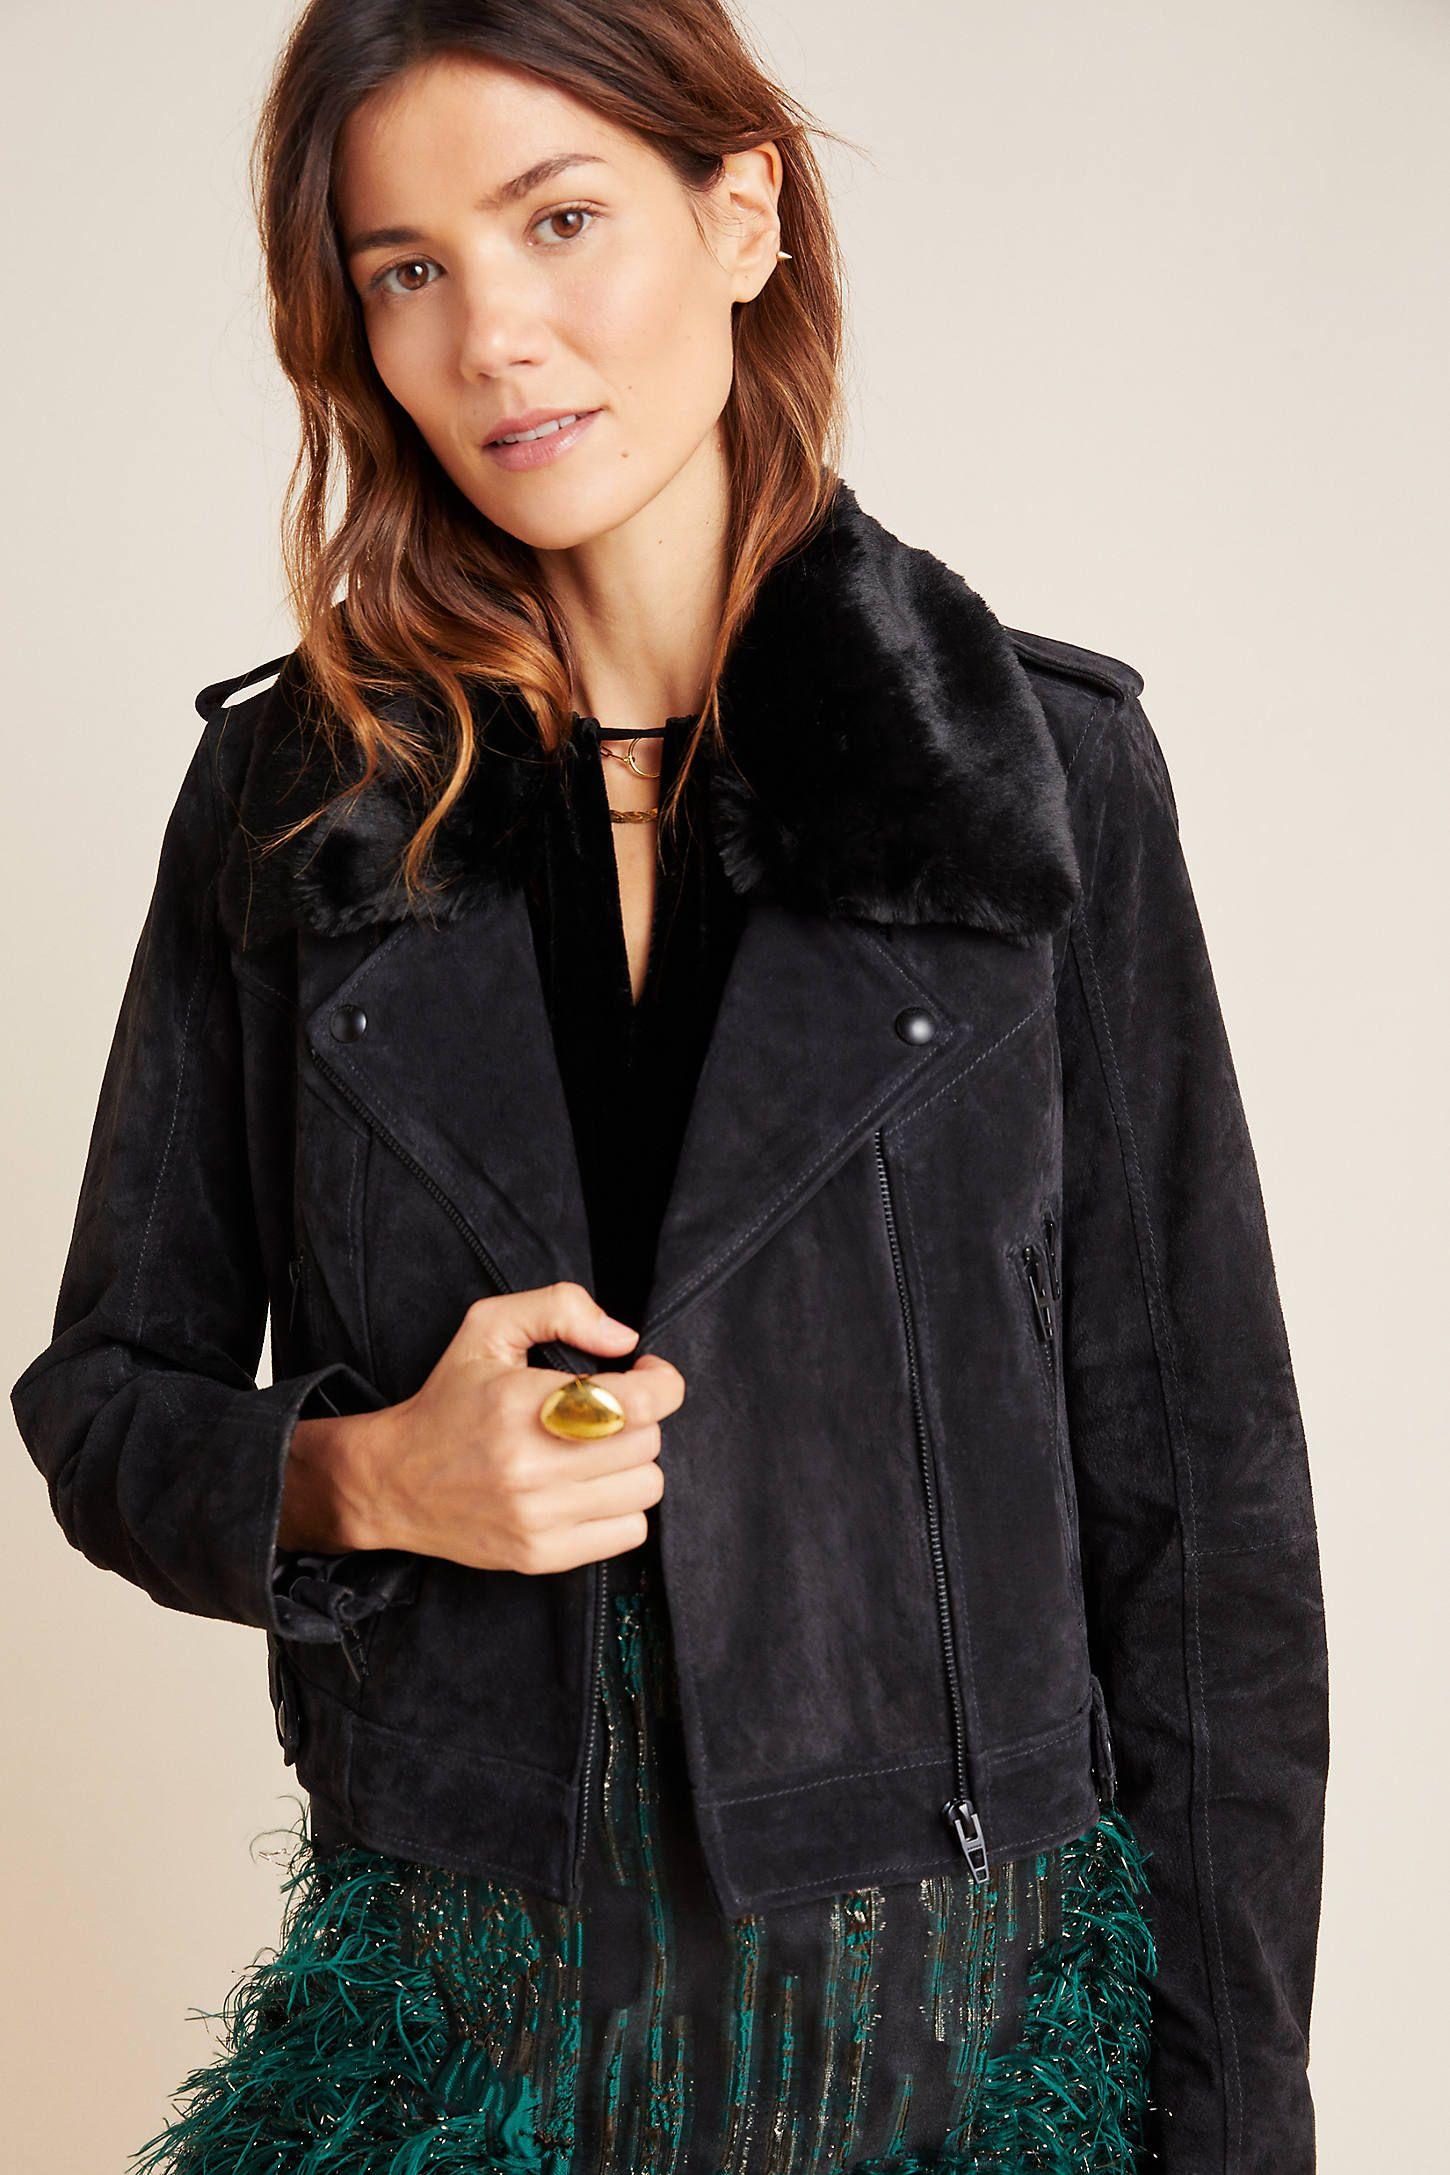 Aragona Suede Moto Jacket by BLANKNYC in Grey Size: L, Women's Jackets at Anthropologie